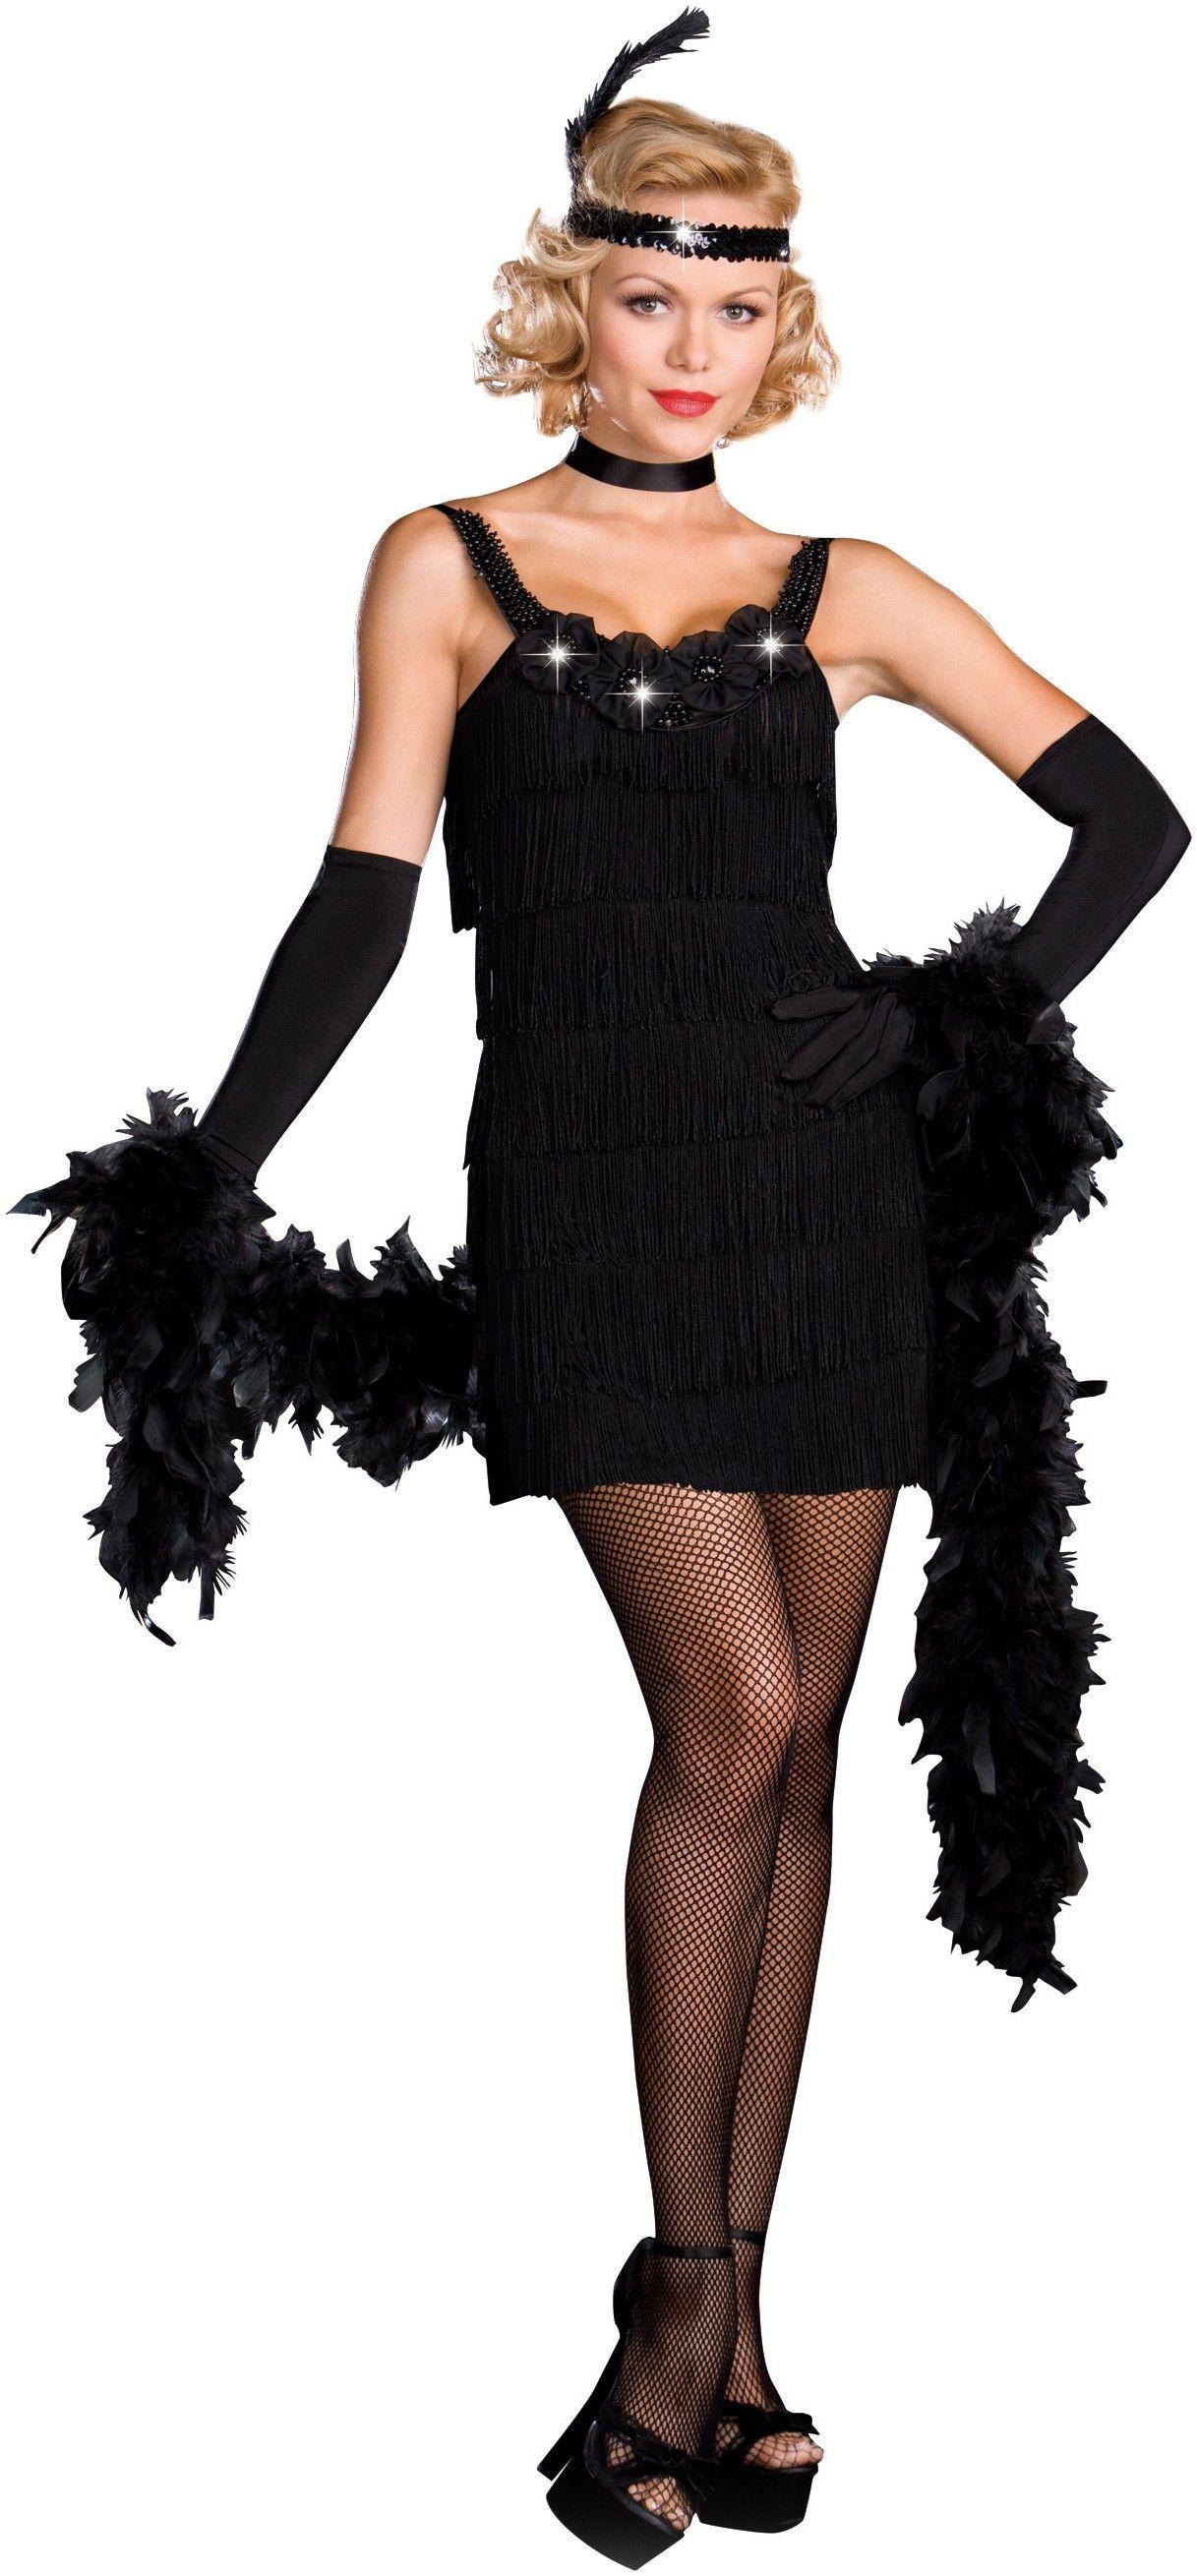 All That Jazz Adult Costume | Costumes.com.au  sc 1 st  Pinterest & All That Jazz Adult Womenu0027s Costume | Pinterest | Jazz Costumes and ...